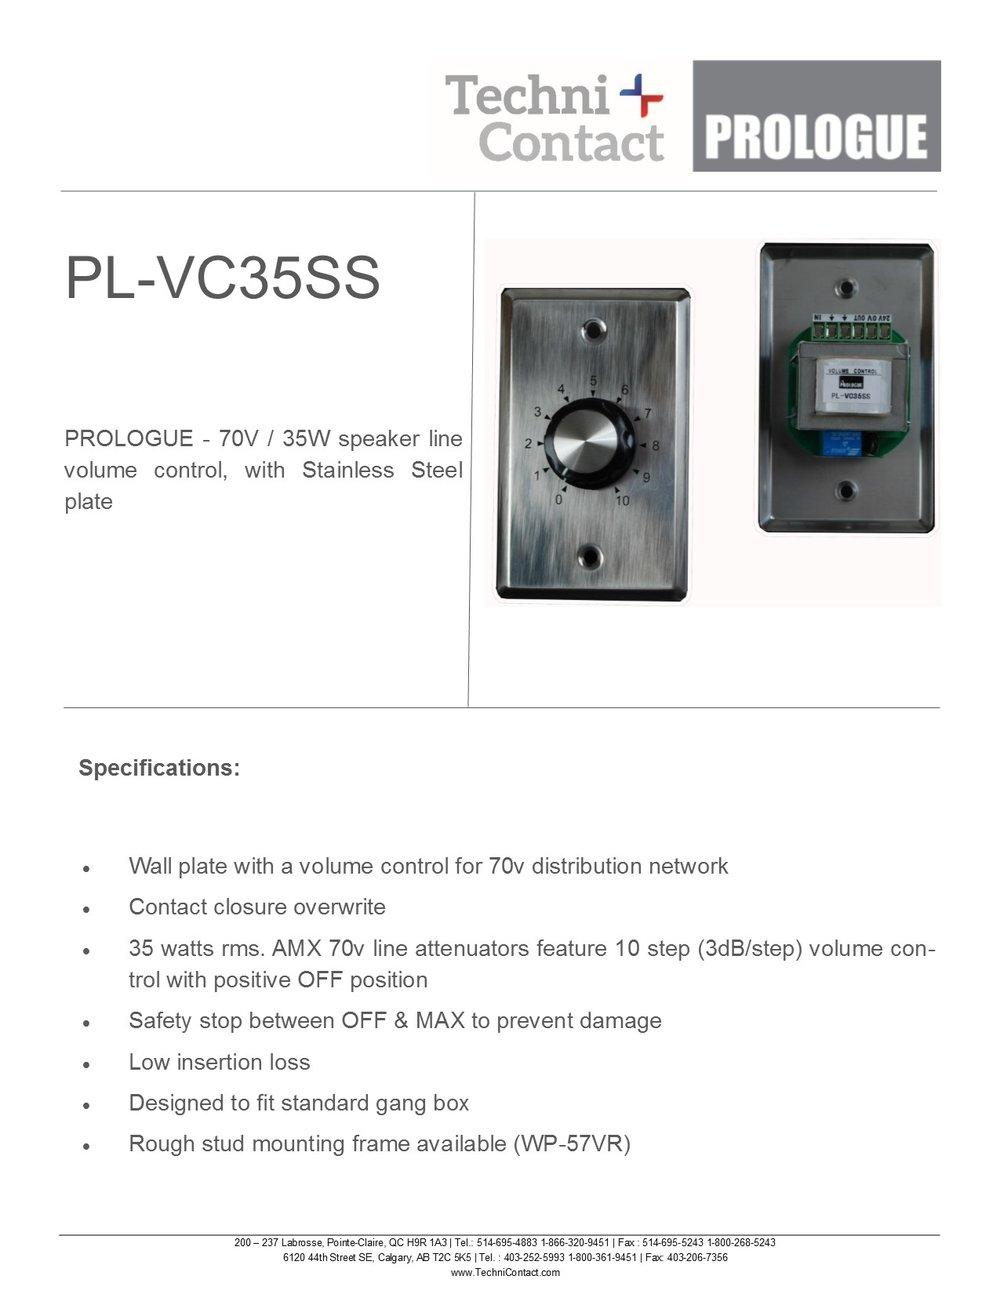 Prologue_PL-VC35SS_SPECS.jpg